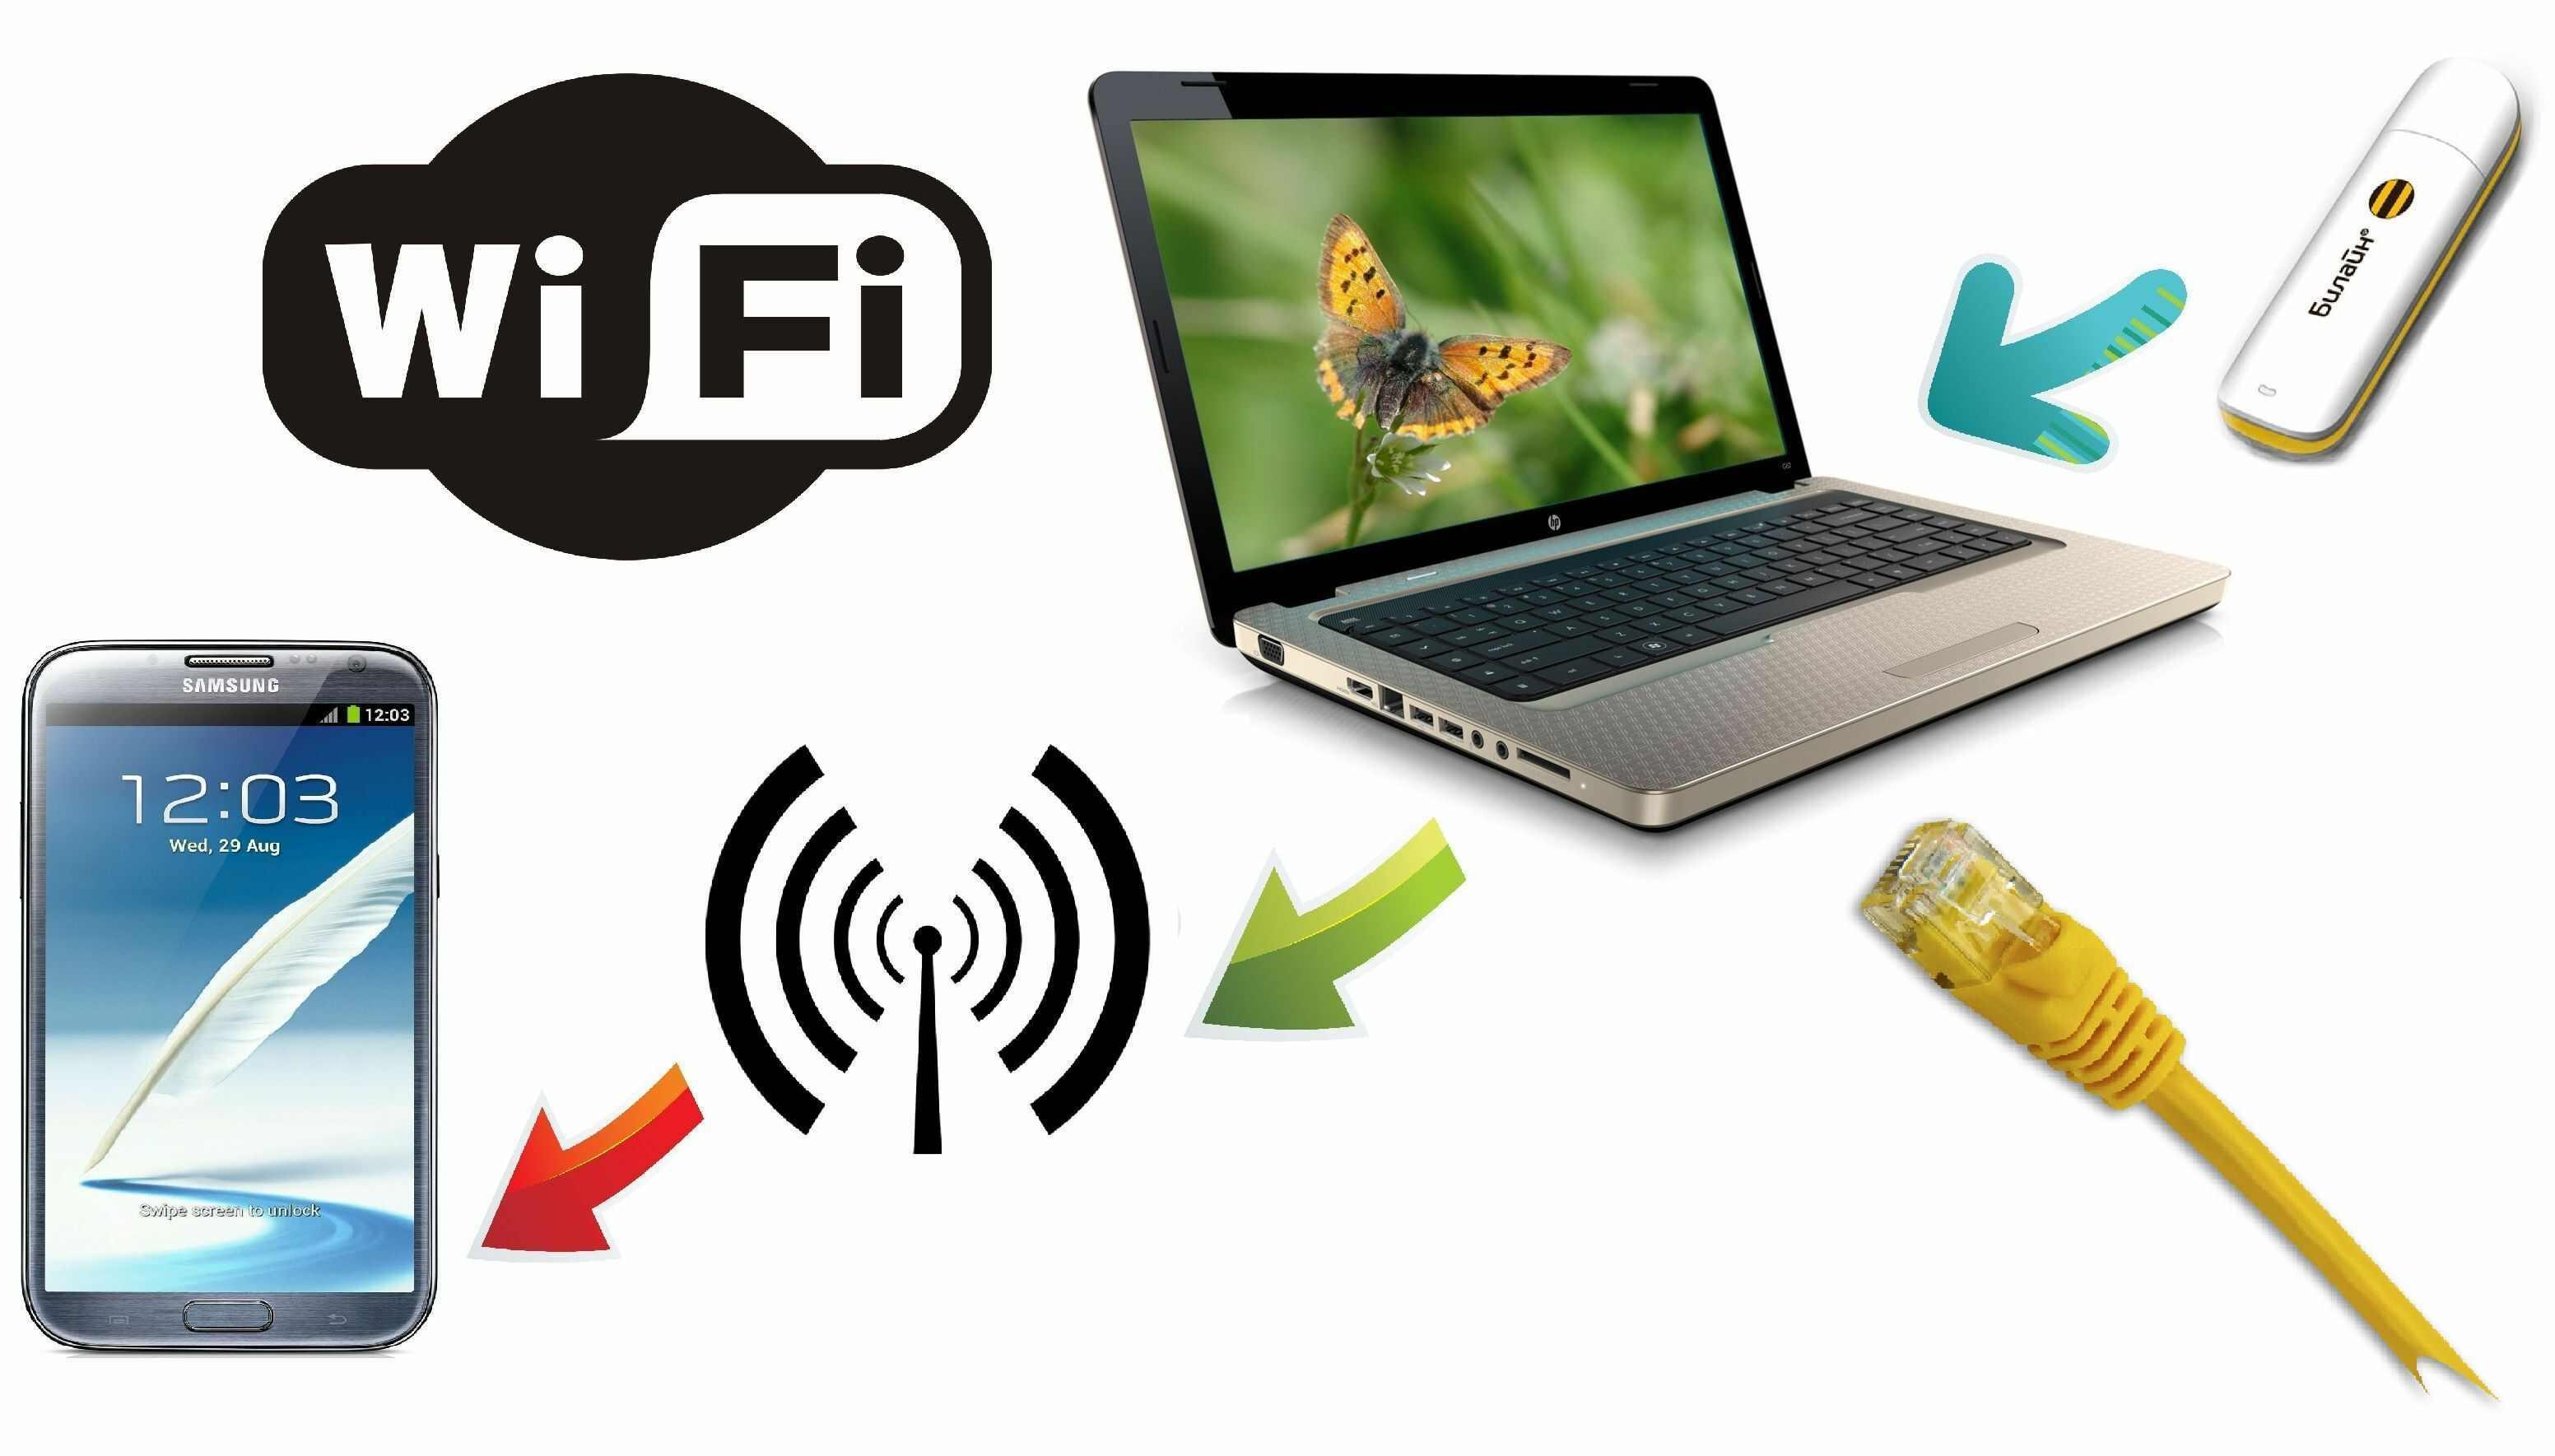 Программа для раздачи wi-fi с ноутбука или пк.